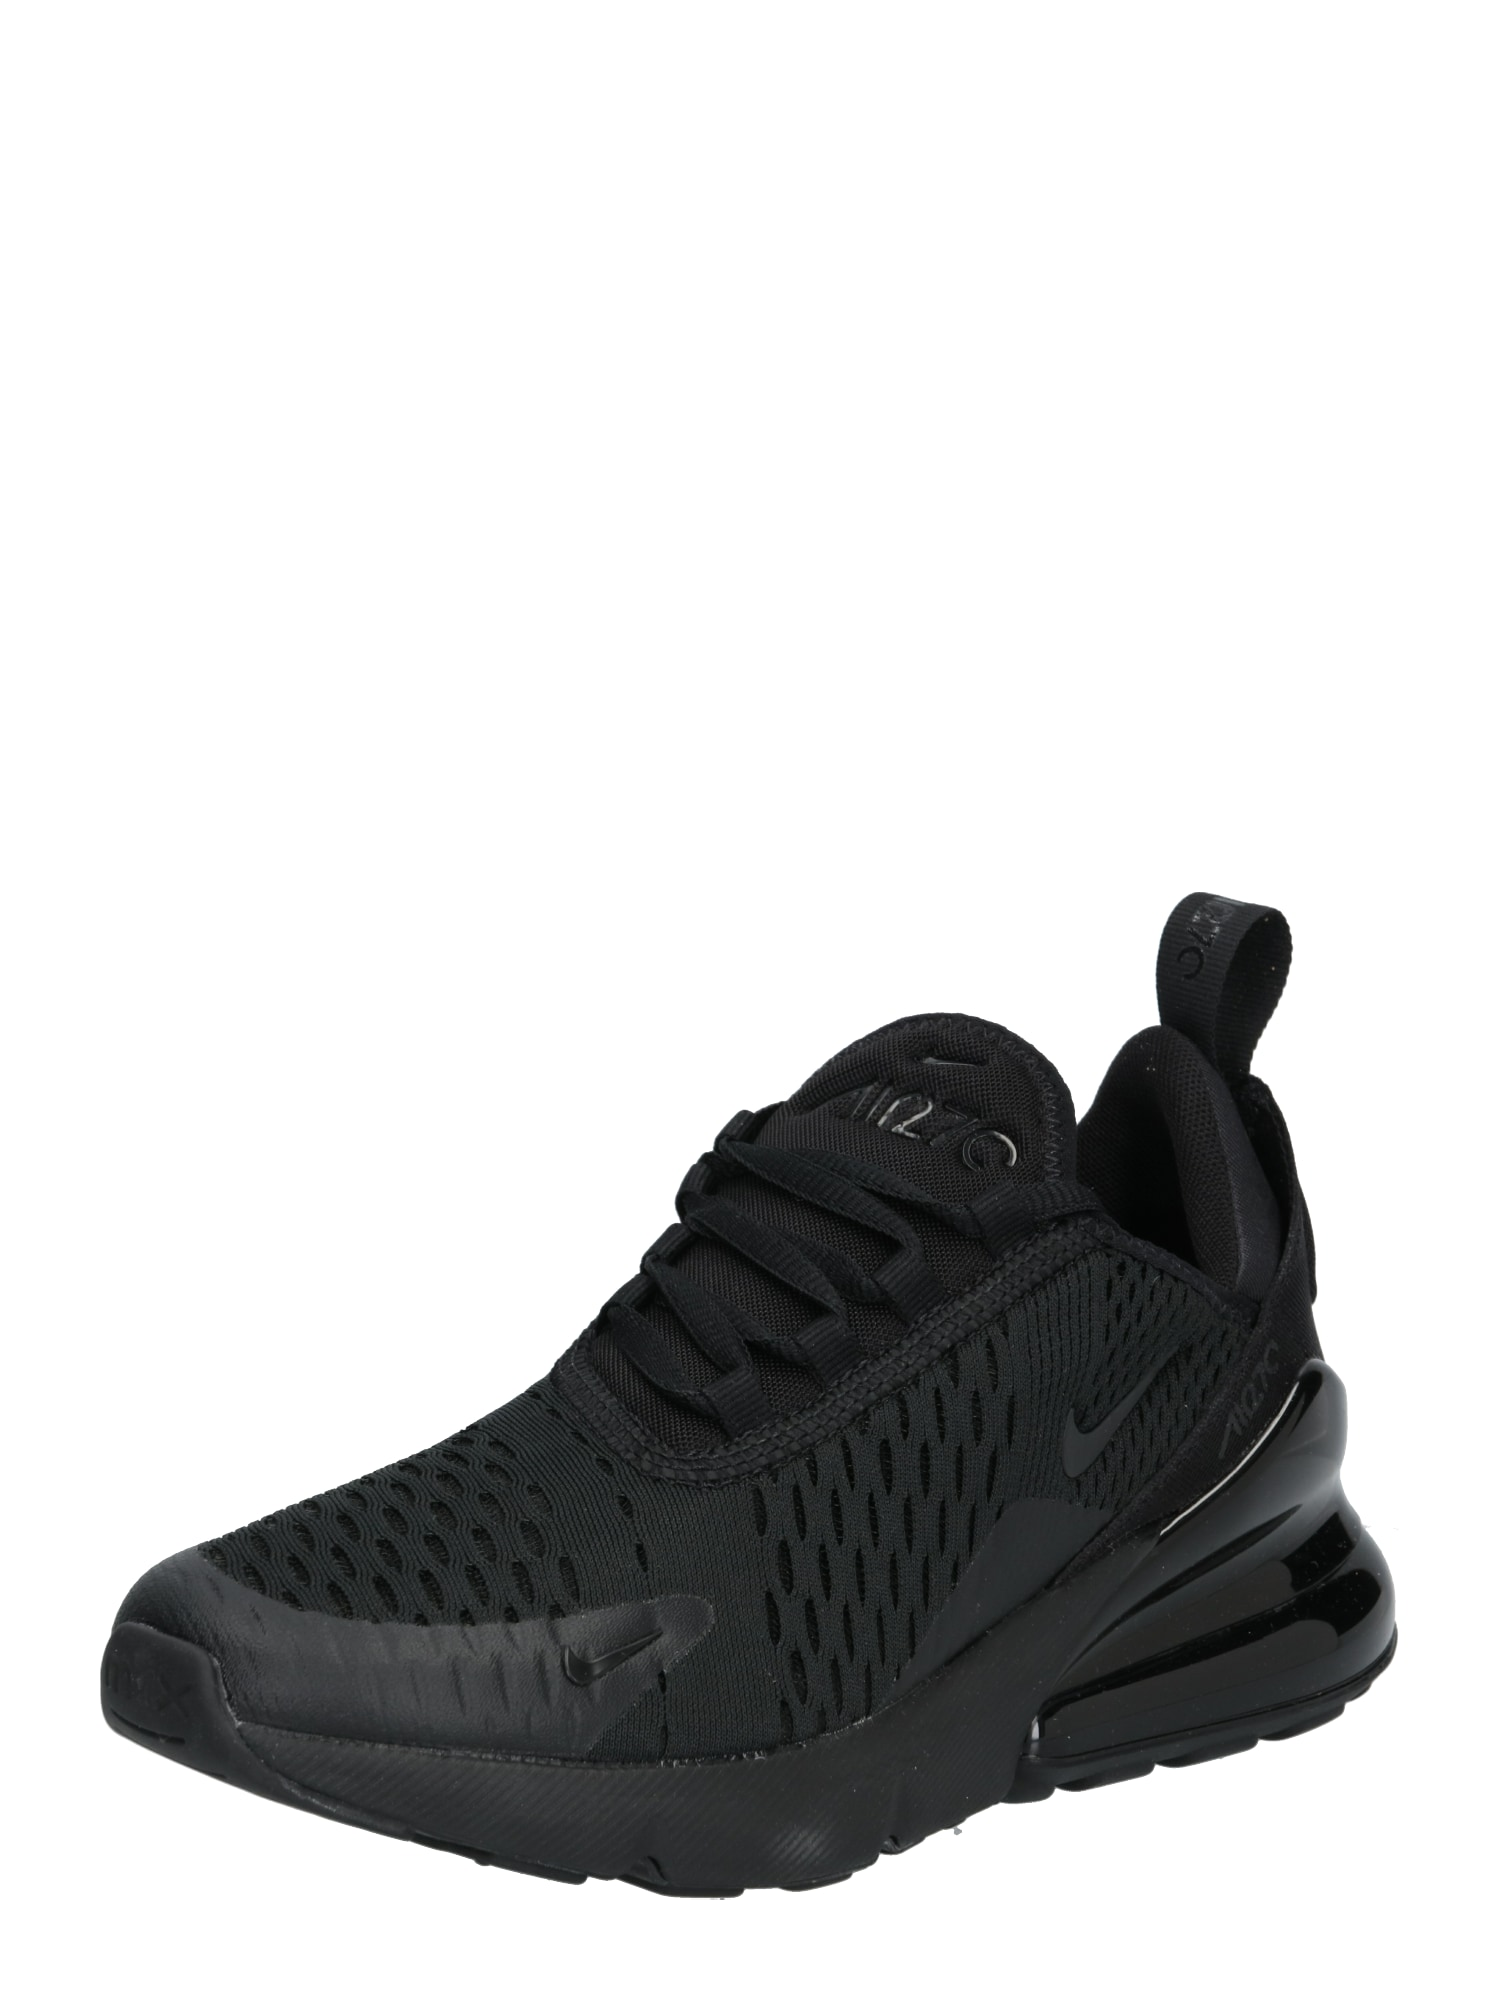 Tenisky AIR MAX 270 BG černá Nike Sportswear